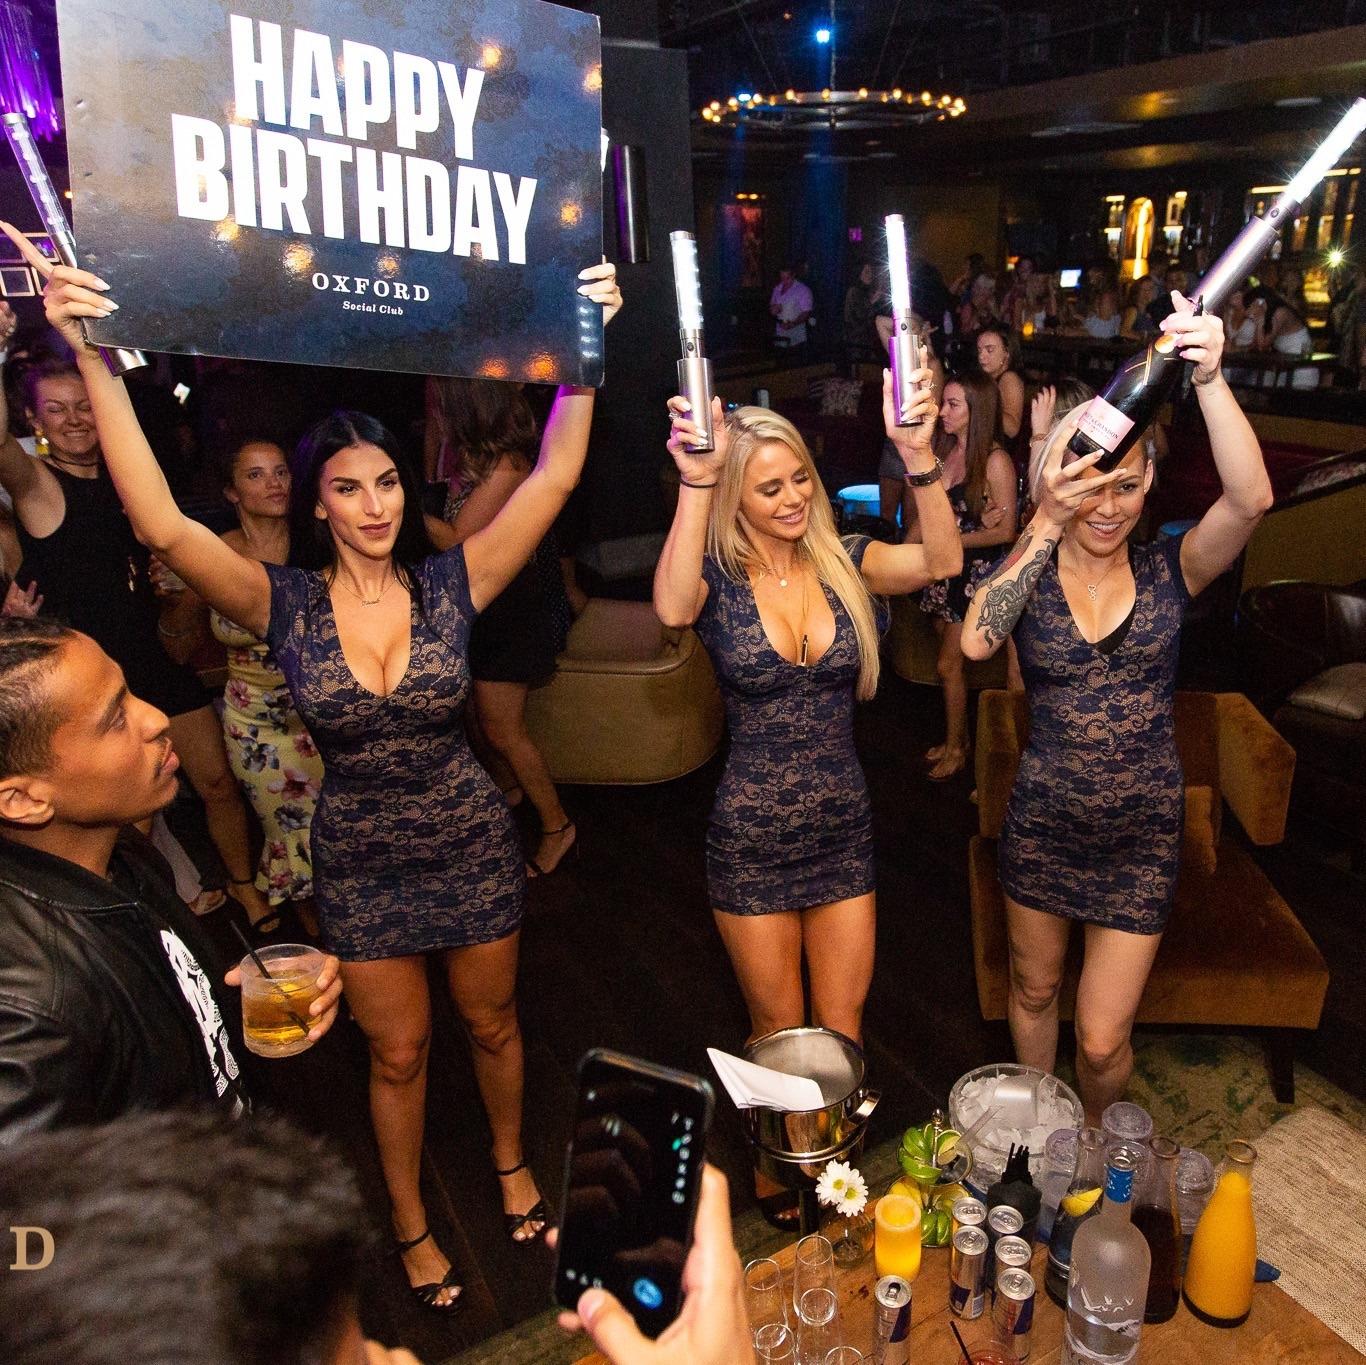 Oxford Nightclub San Diego - Three Beautiful Staff Waitresses